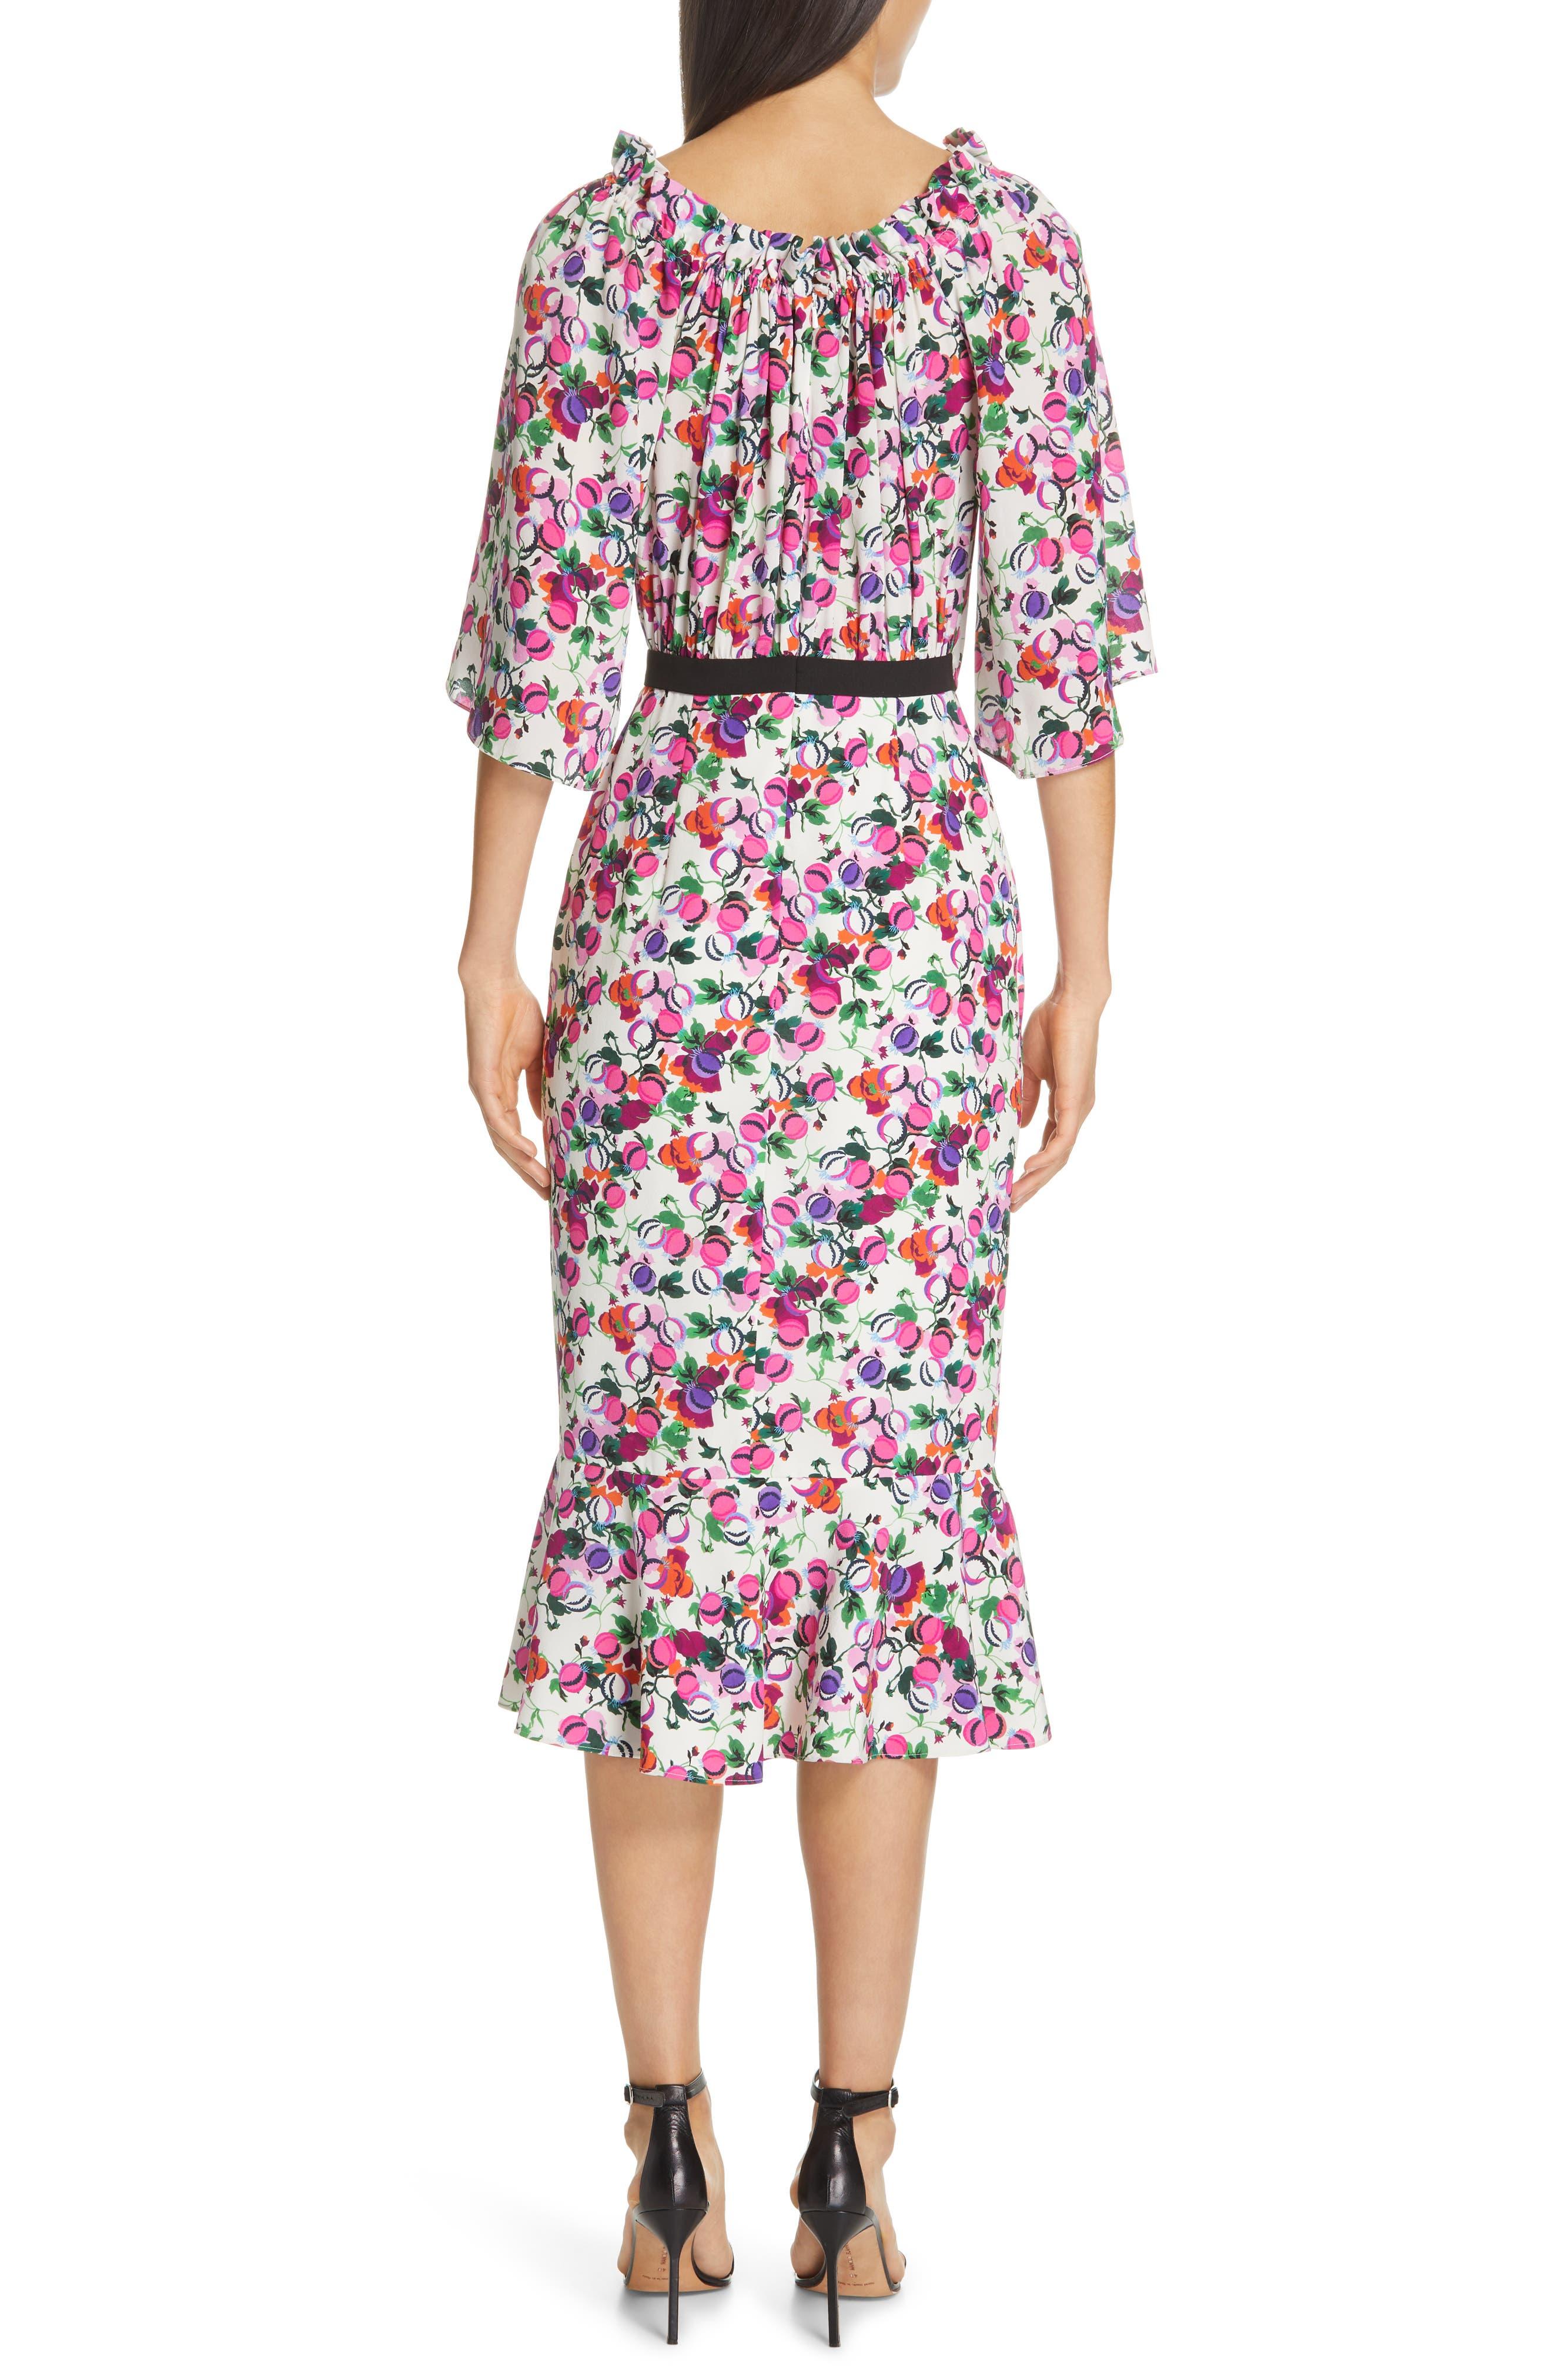 SALONI, Olivia Floral Print Off the Shoulder Midi Dress, Alternate thumbnail 2, color, ROSE BOUNTY BLACK